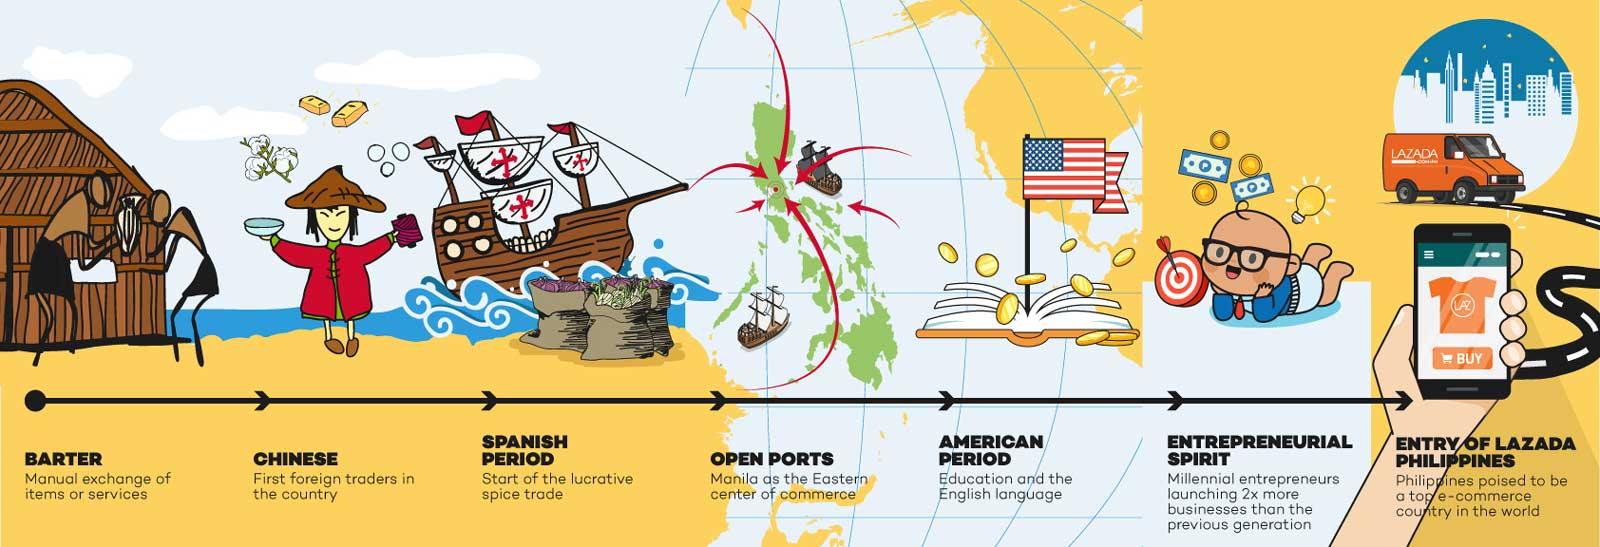 Philippine Commerce Through the Years